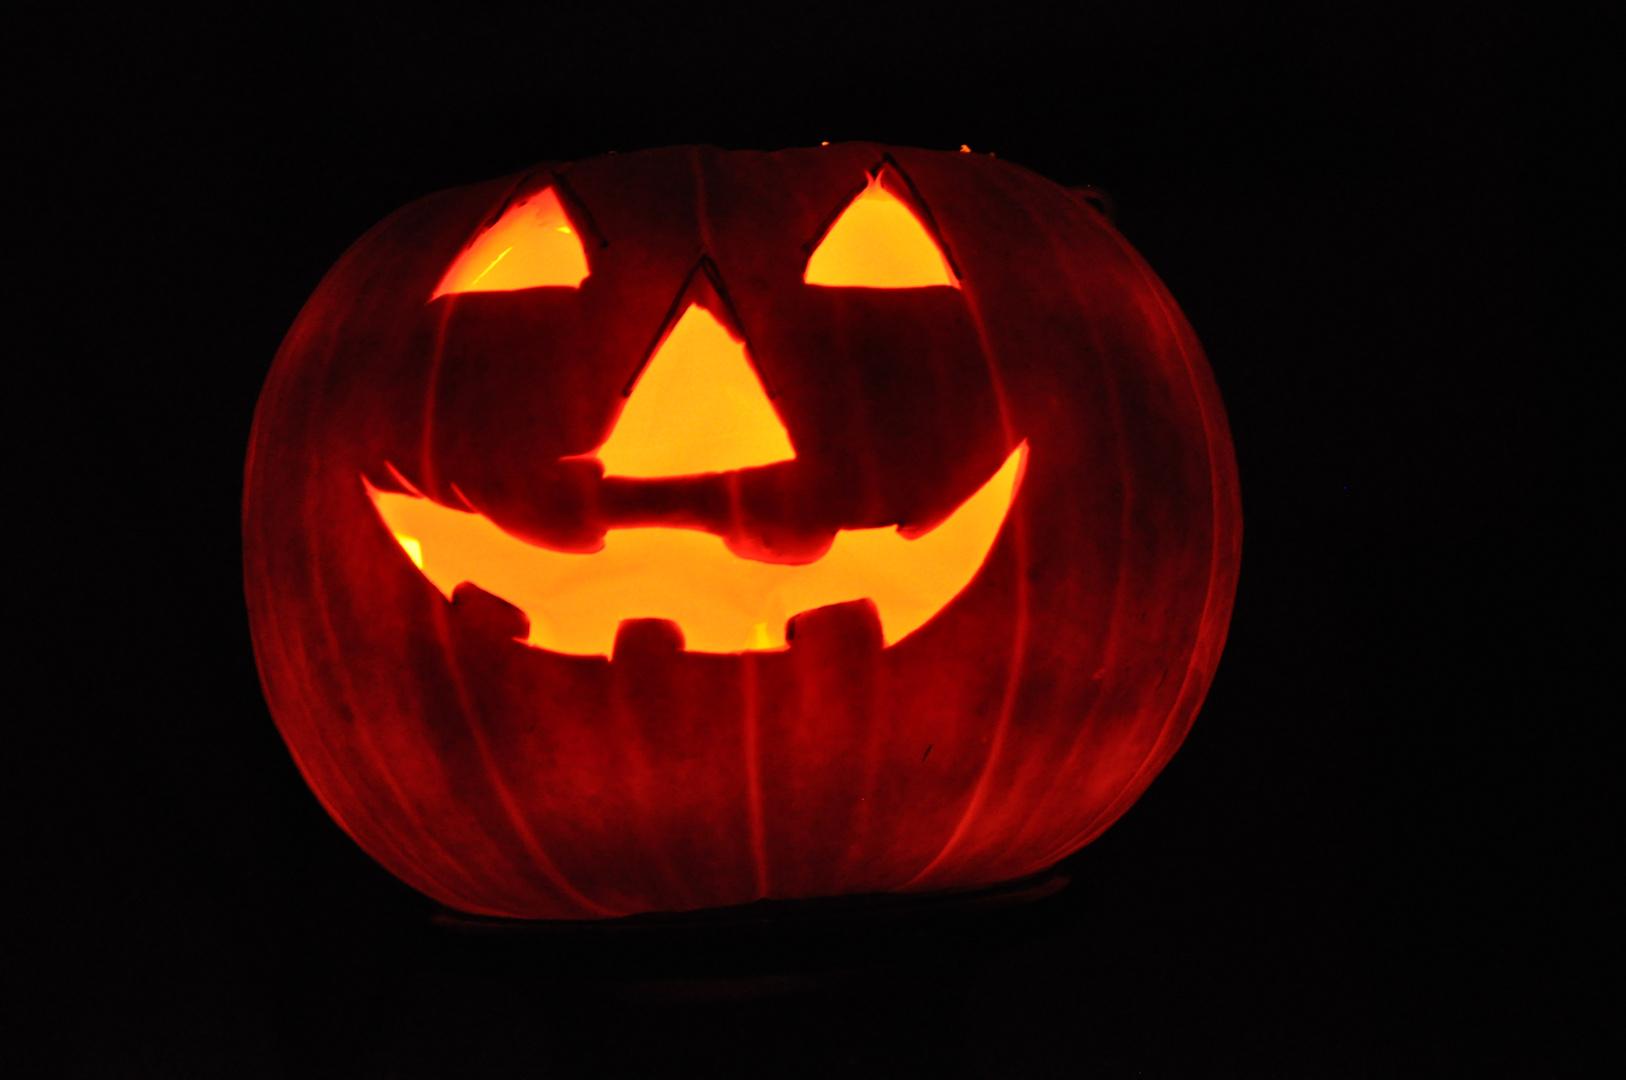 ¡¡¡¡halloween!!!!